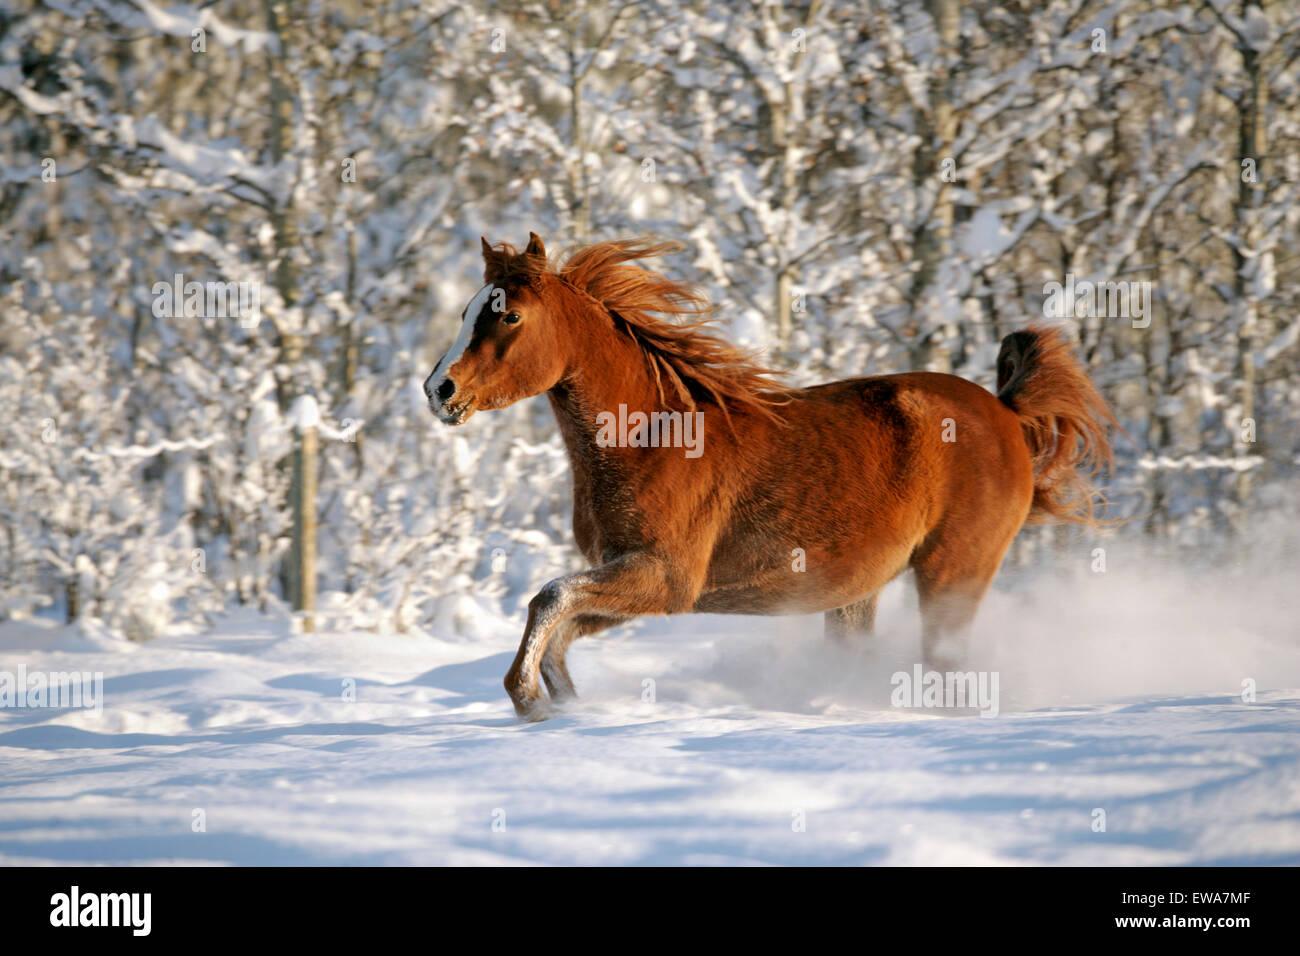 Purebred Chestnut Arabian Mare running through fresh snow - Stock Image